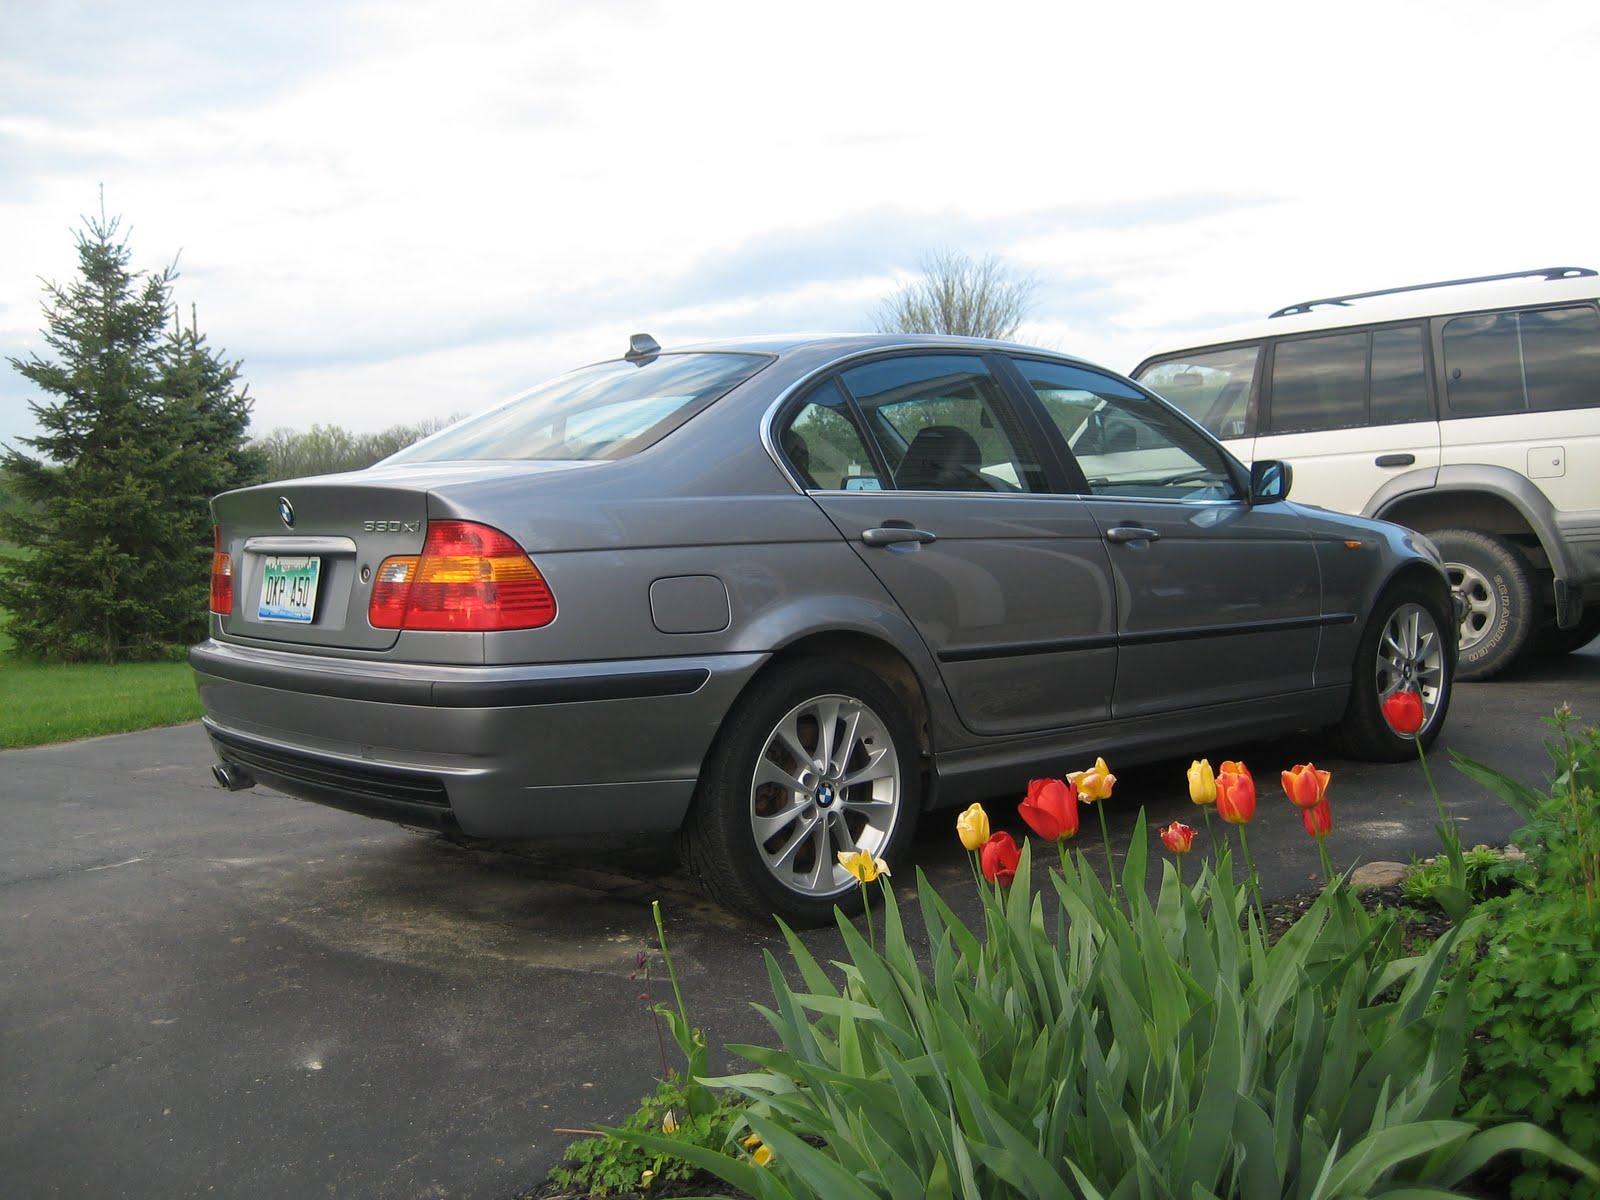 2004 bmw 330xi 6 speed manual groosh s garage rh grooshsgarage com 6-Speed Manual Transmission BMW Manual Transmission